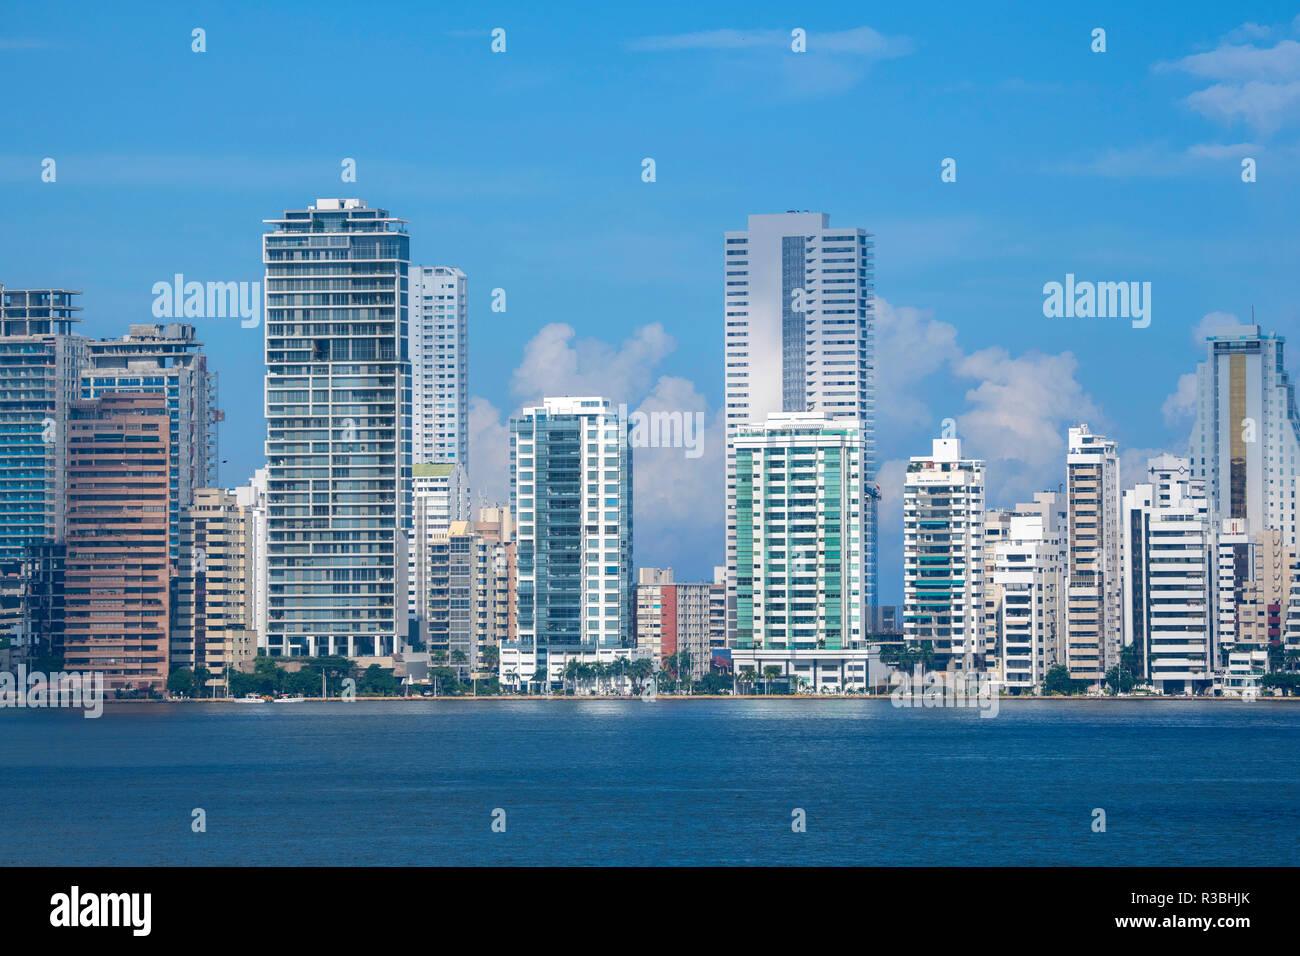 South America, Colombia, Cartagena. Modern Boca Grande area city skyline view from Cartagena Bay. Stock Photo